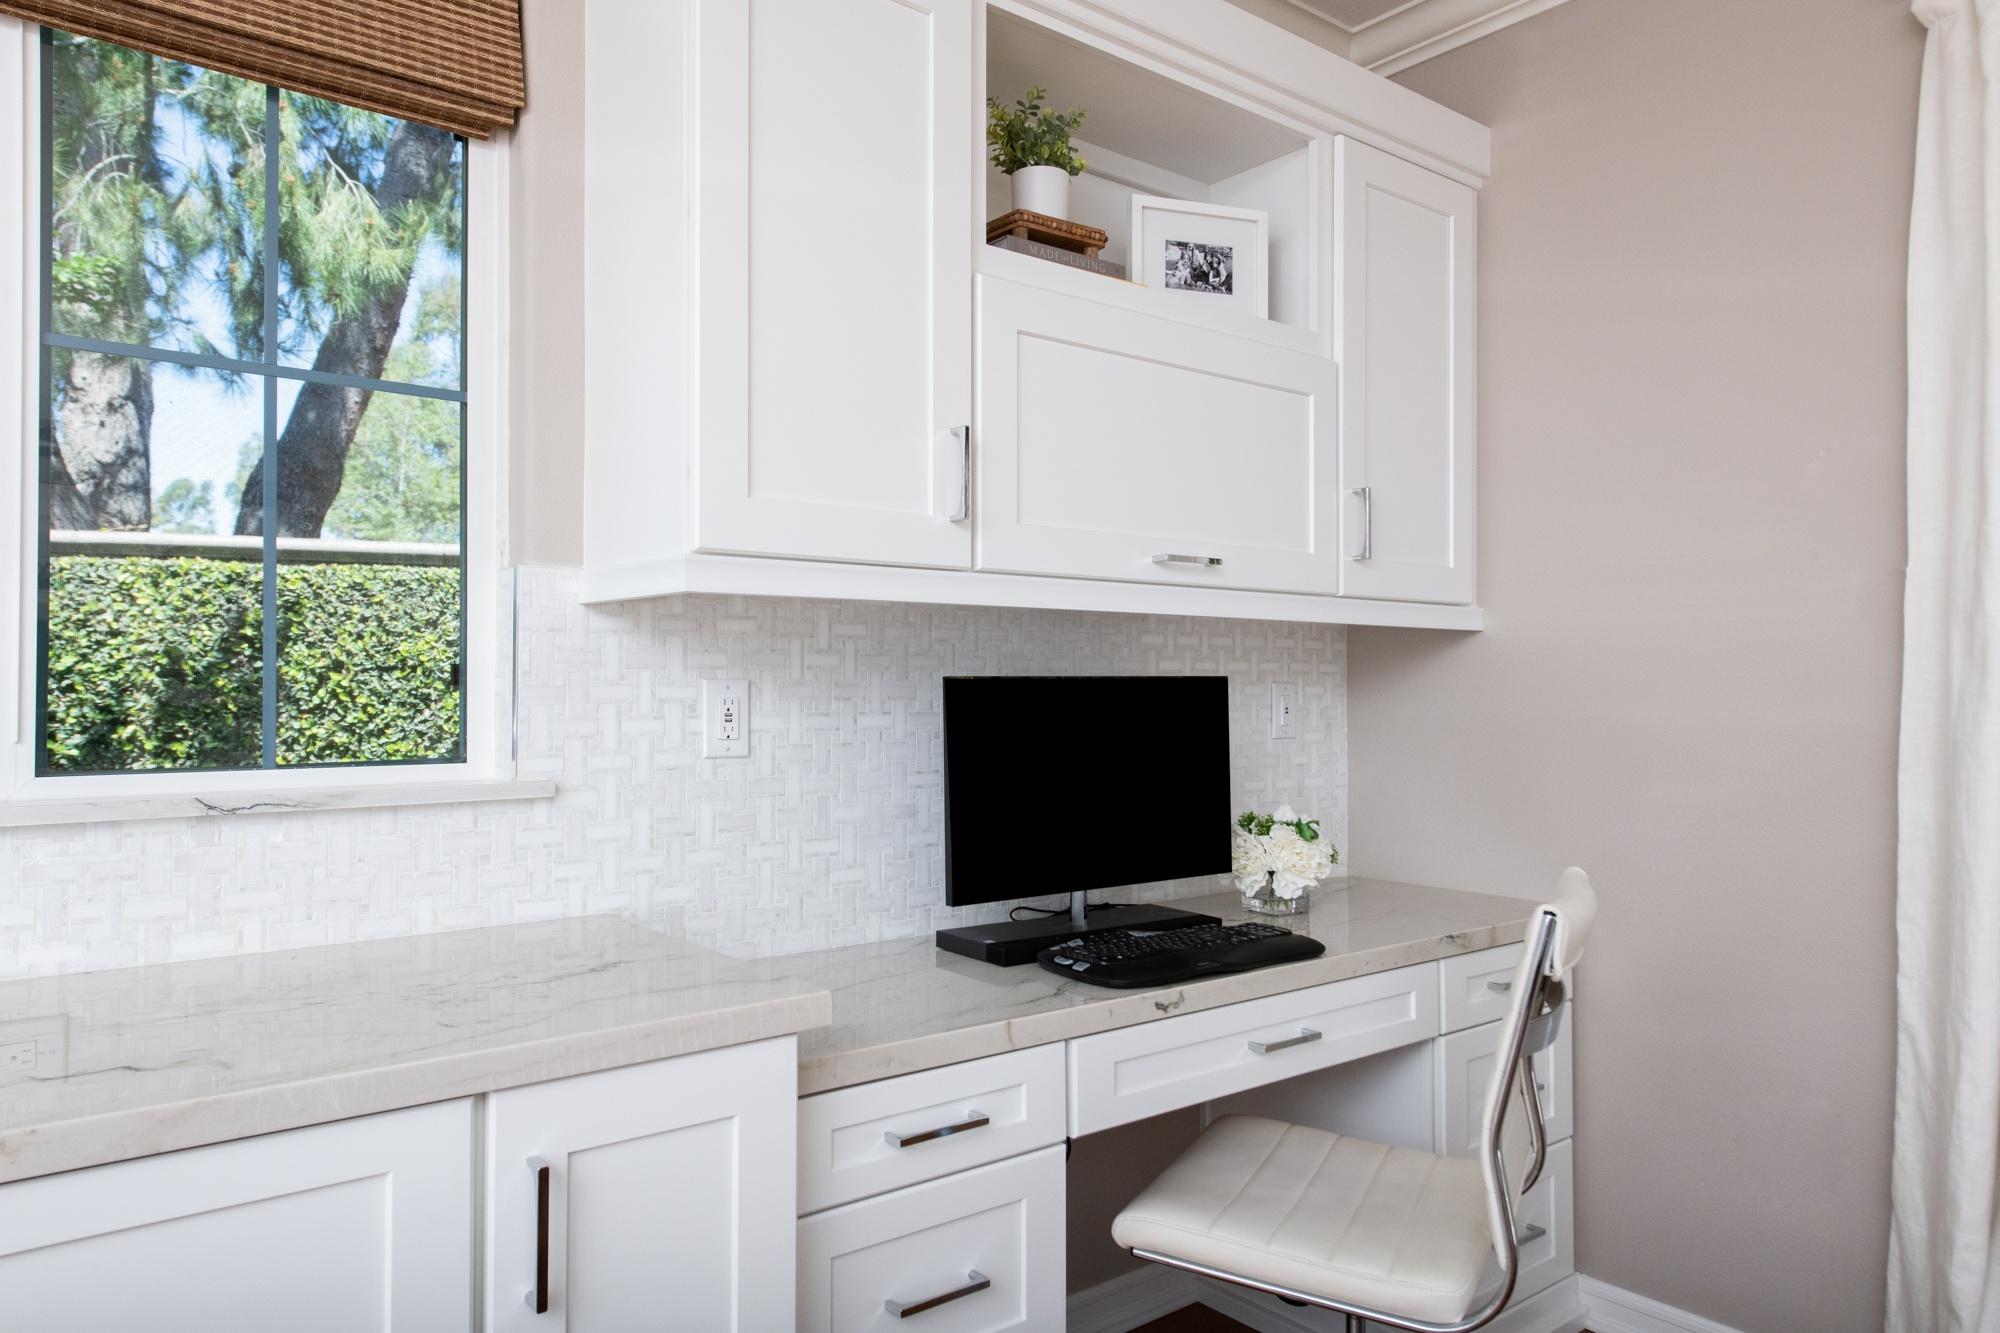 Desk area in a kitchen remodel.